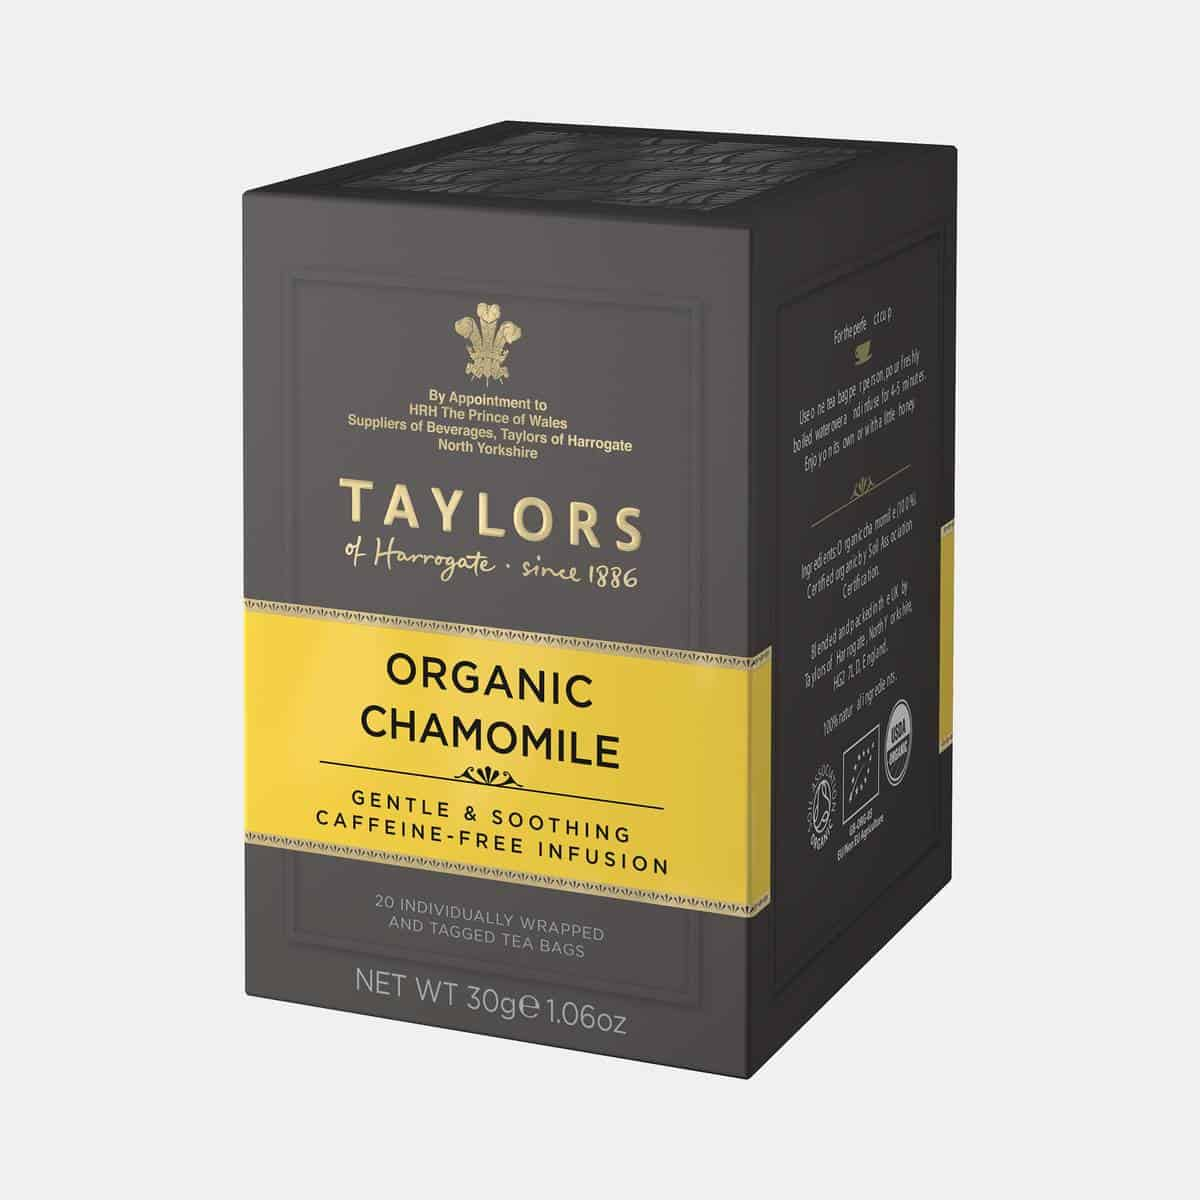 Taylors of Harrogate Organic Chamomile Tea 30g